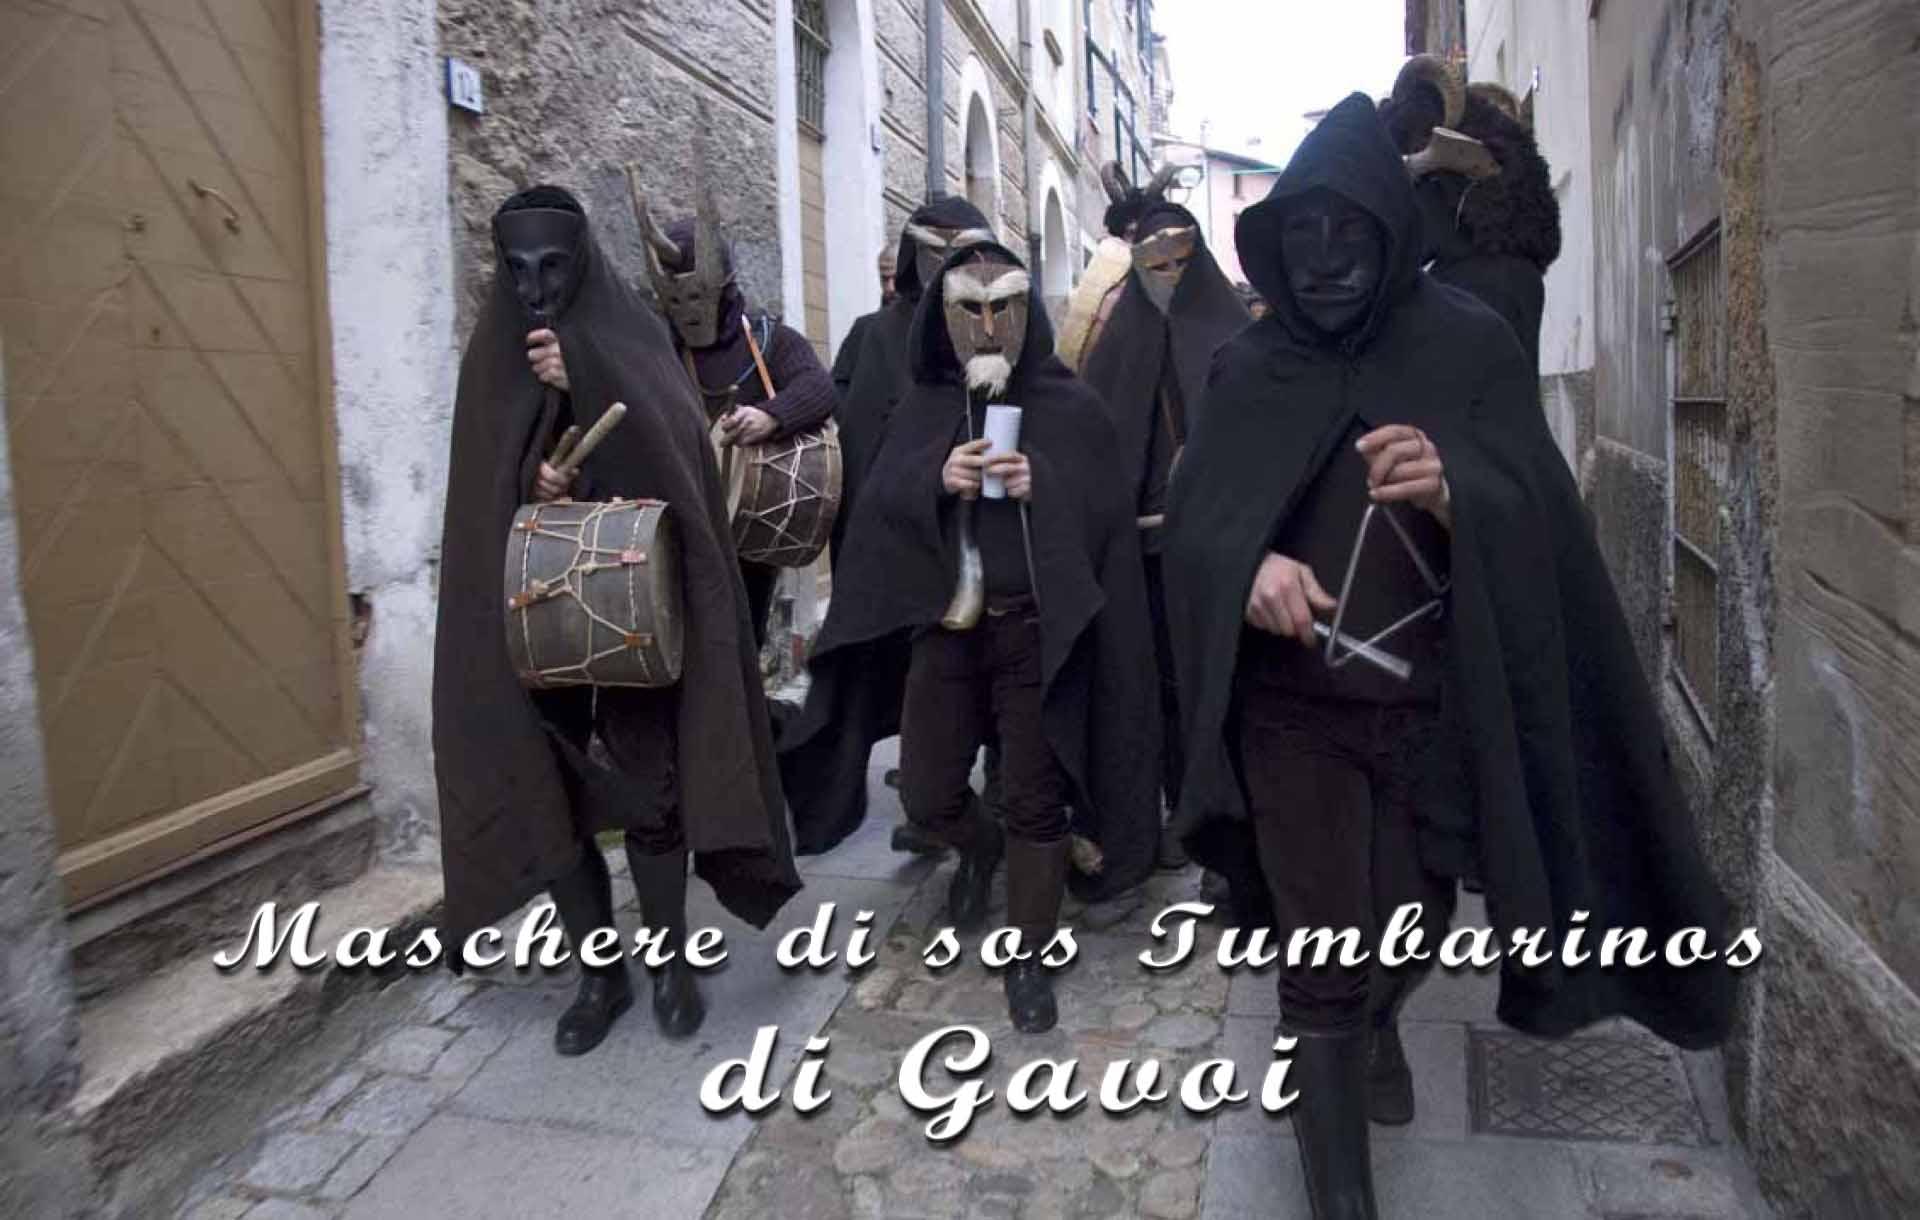 Maschere di sos Tumbarinos di Gavoi 2014